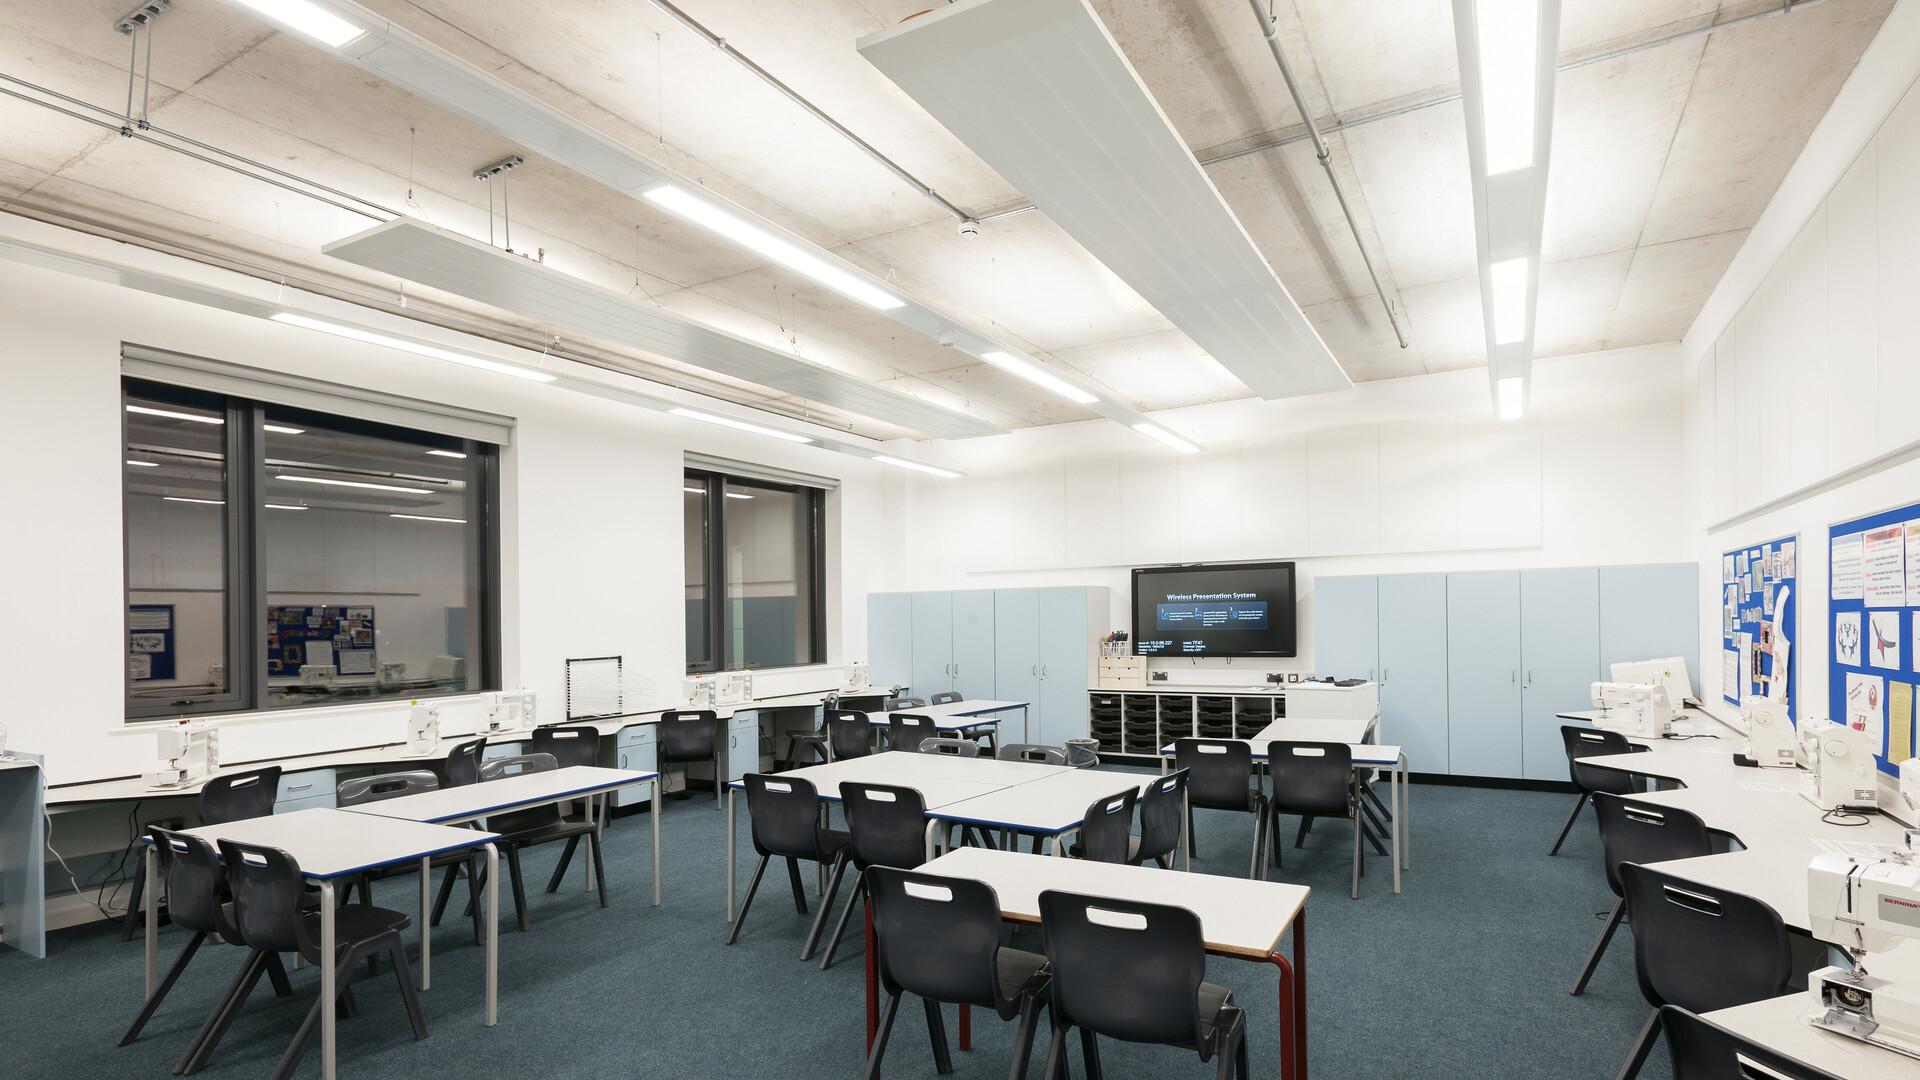 Acoustic ceiling solution: Rockfon® Scholar™ wall panel, 1800 x 600